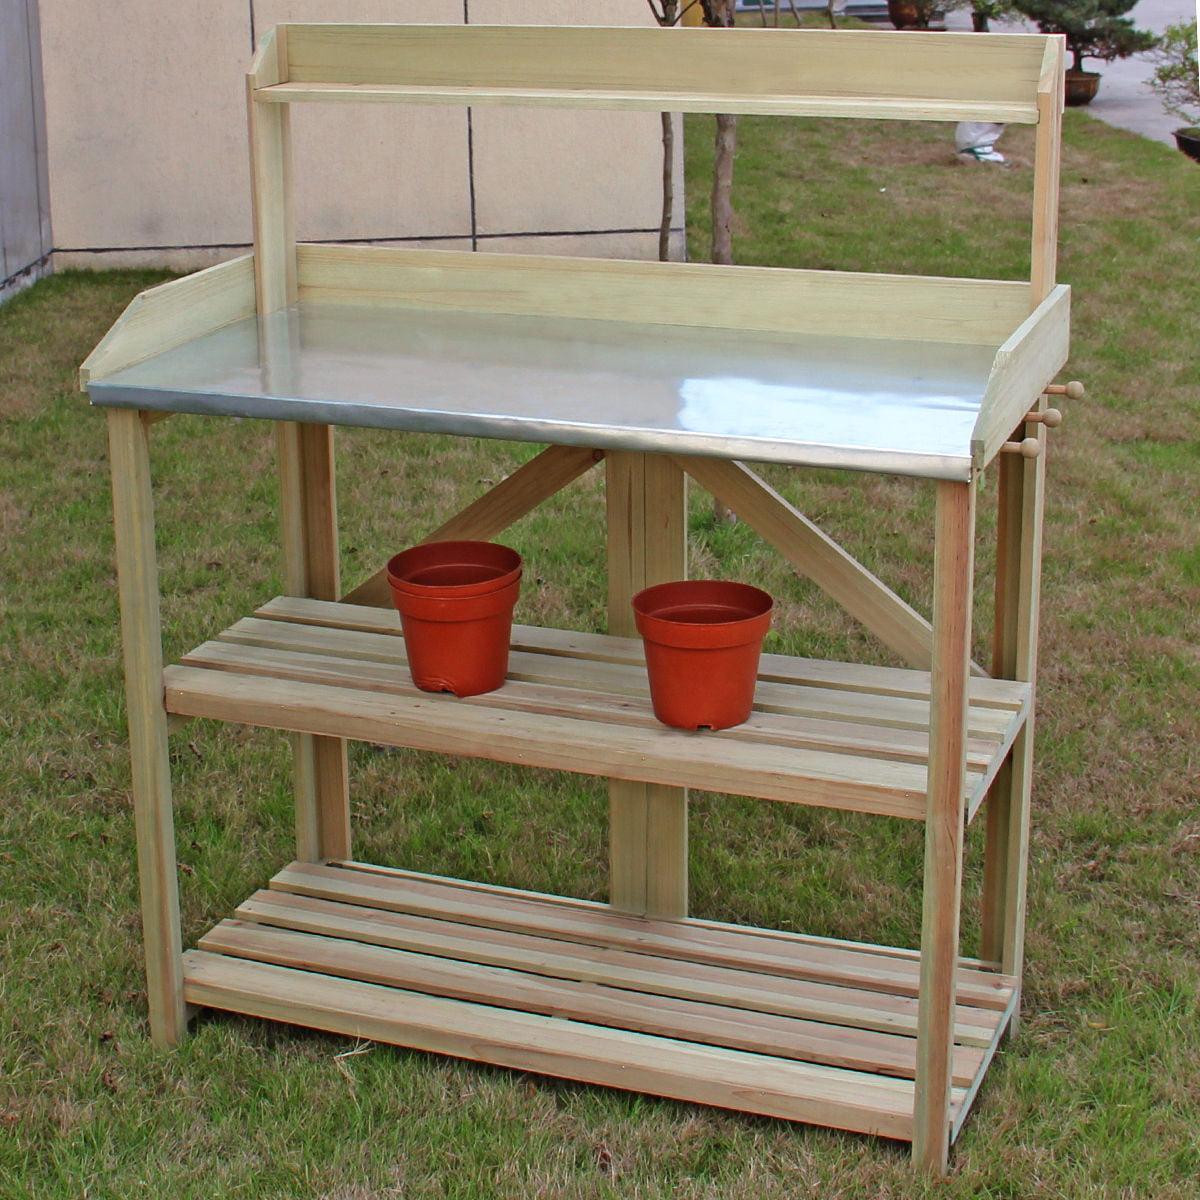 Costway Outdoor Garden Wooden Potting Work Bench Station Planting Workbench W/ 3 Shelf